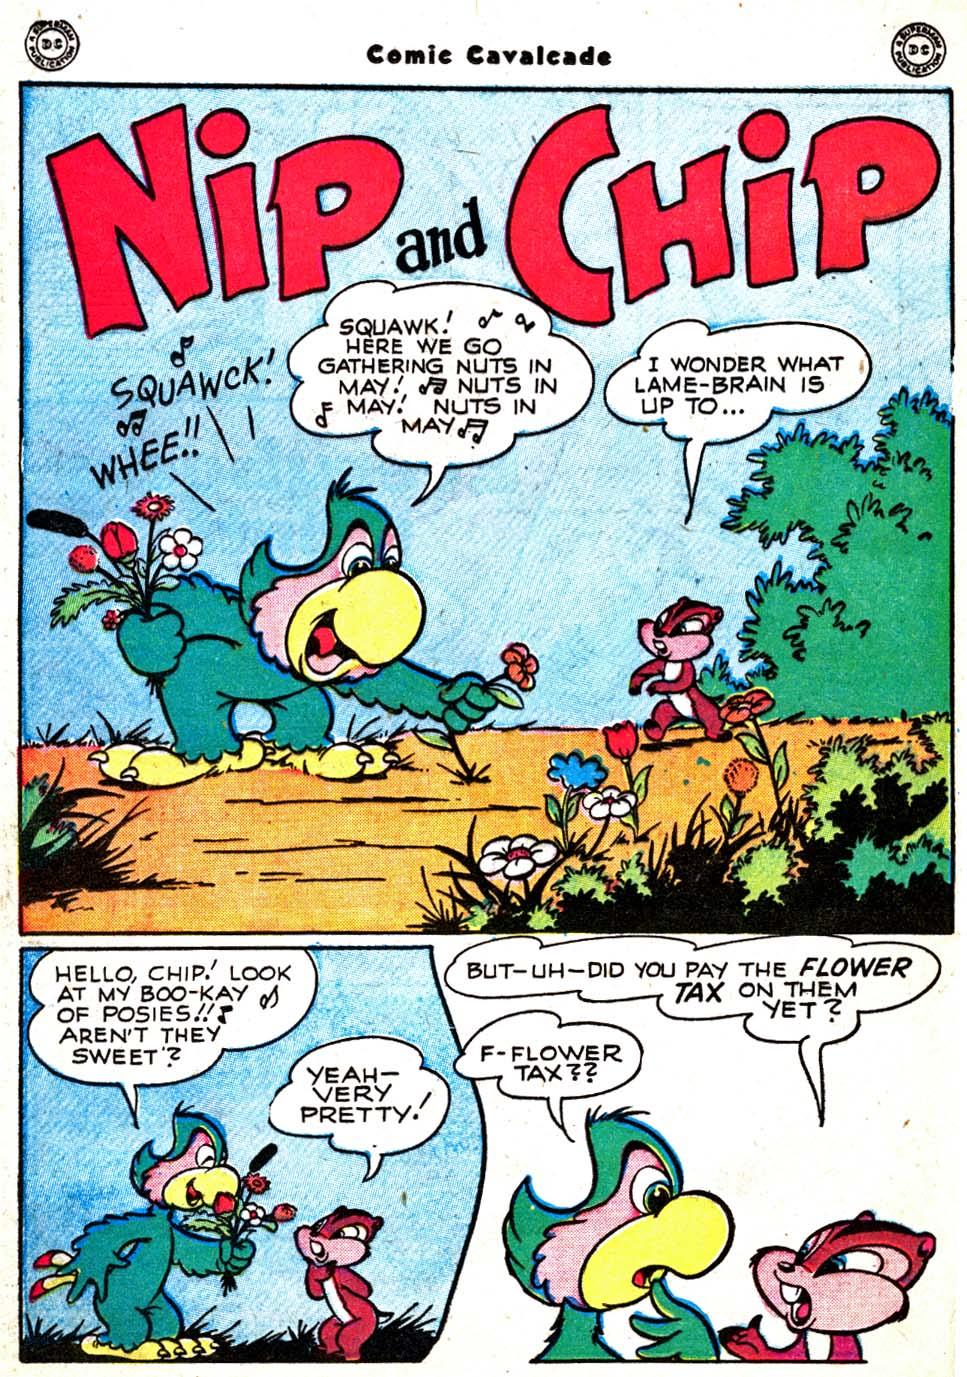 Comic Cavalcade issue 31 - Page 60